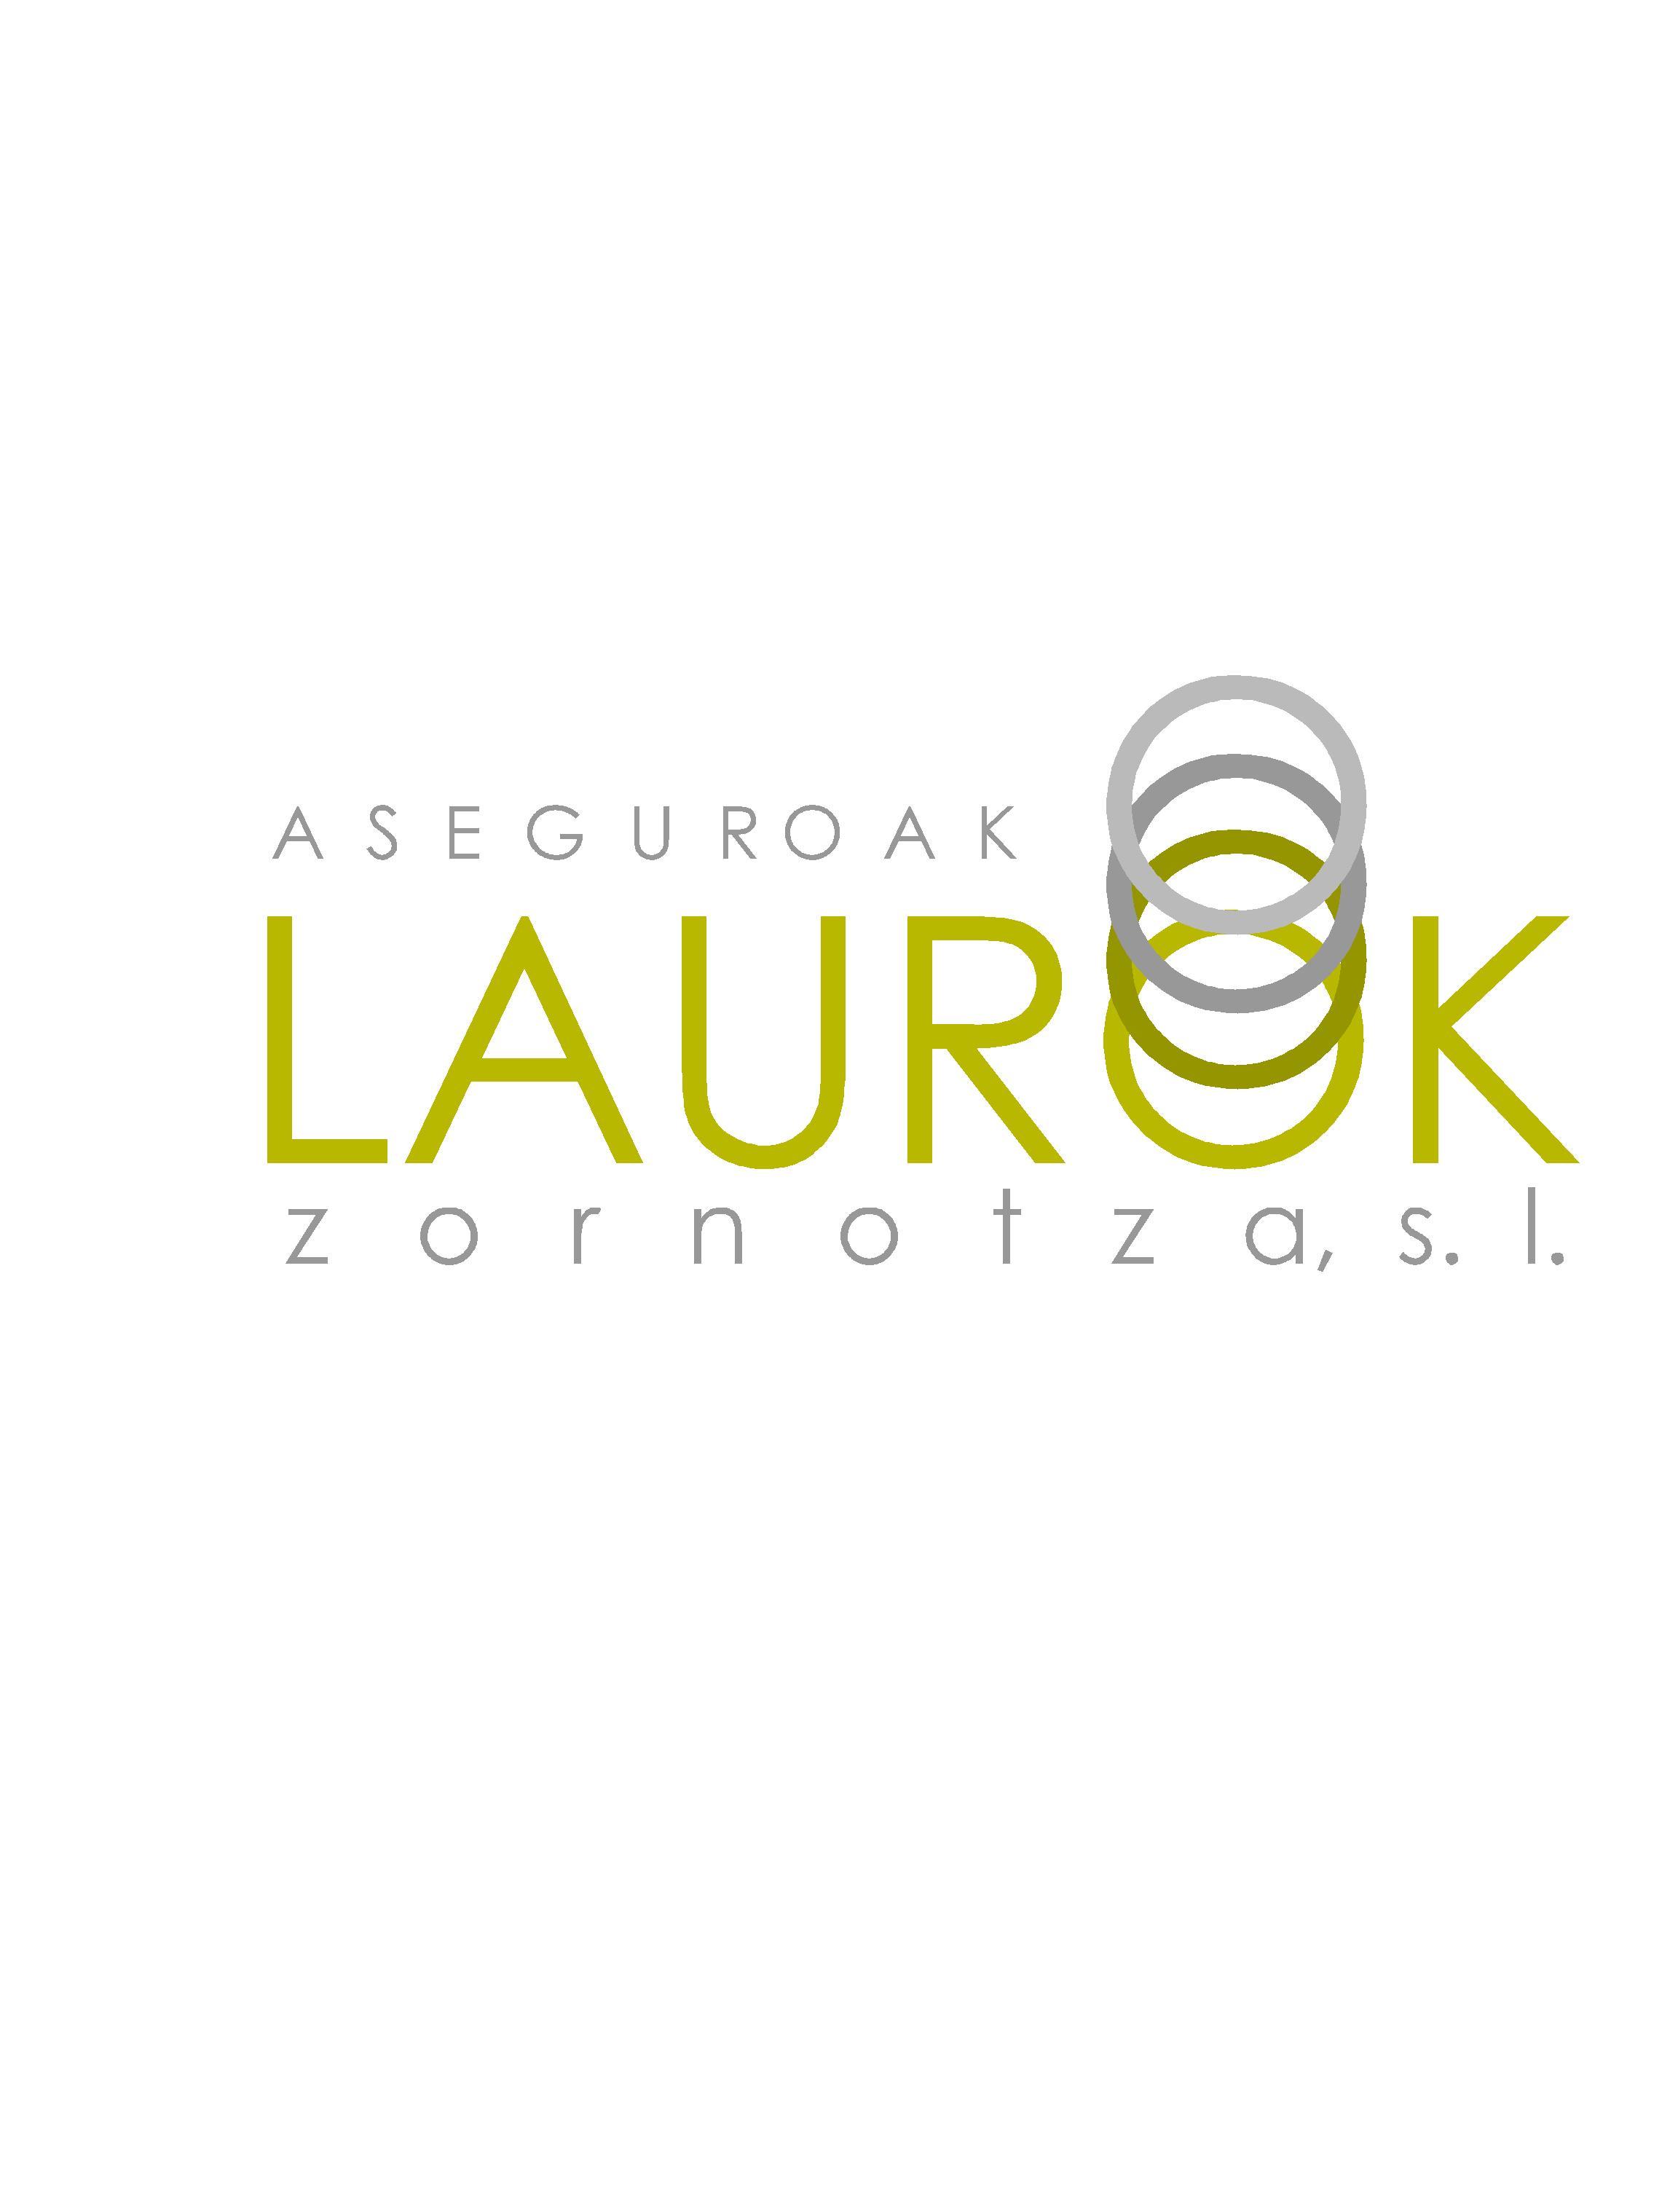 Laurok Zornotza S.L.